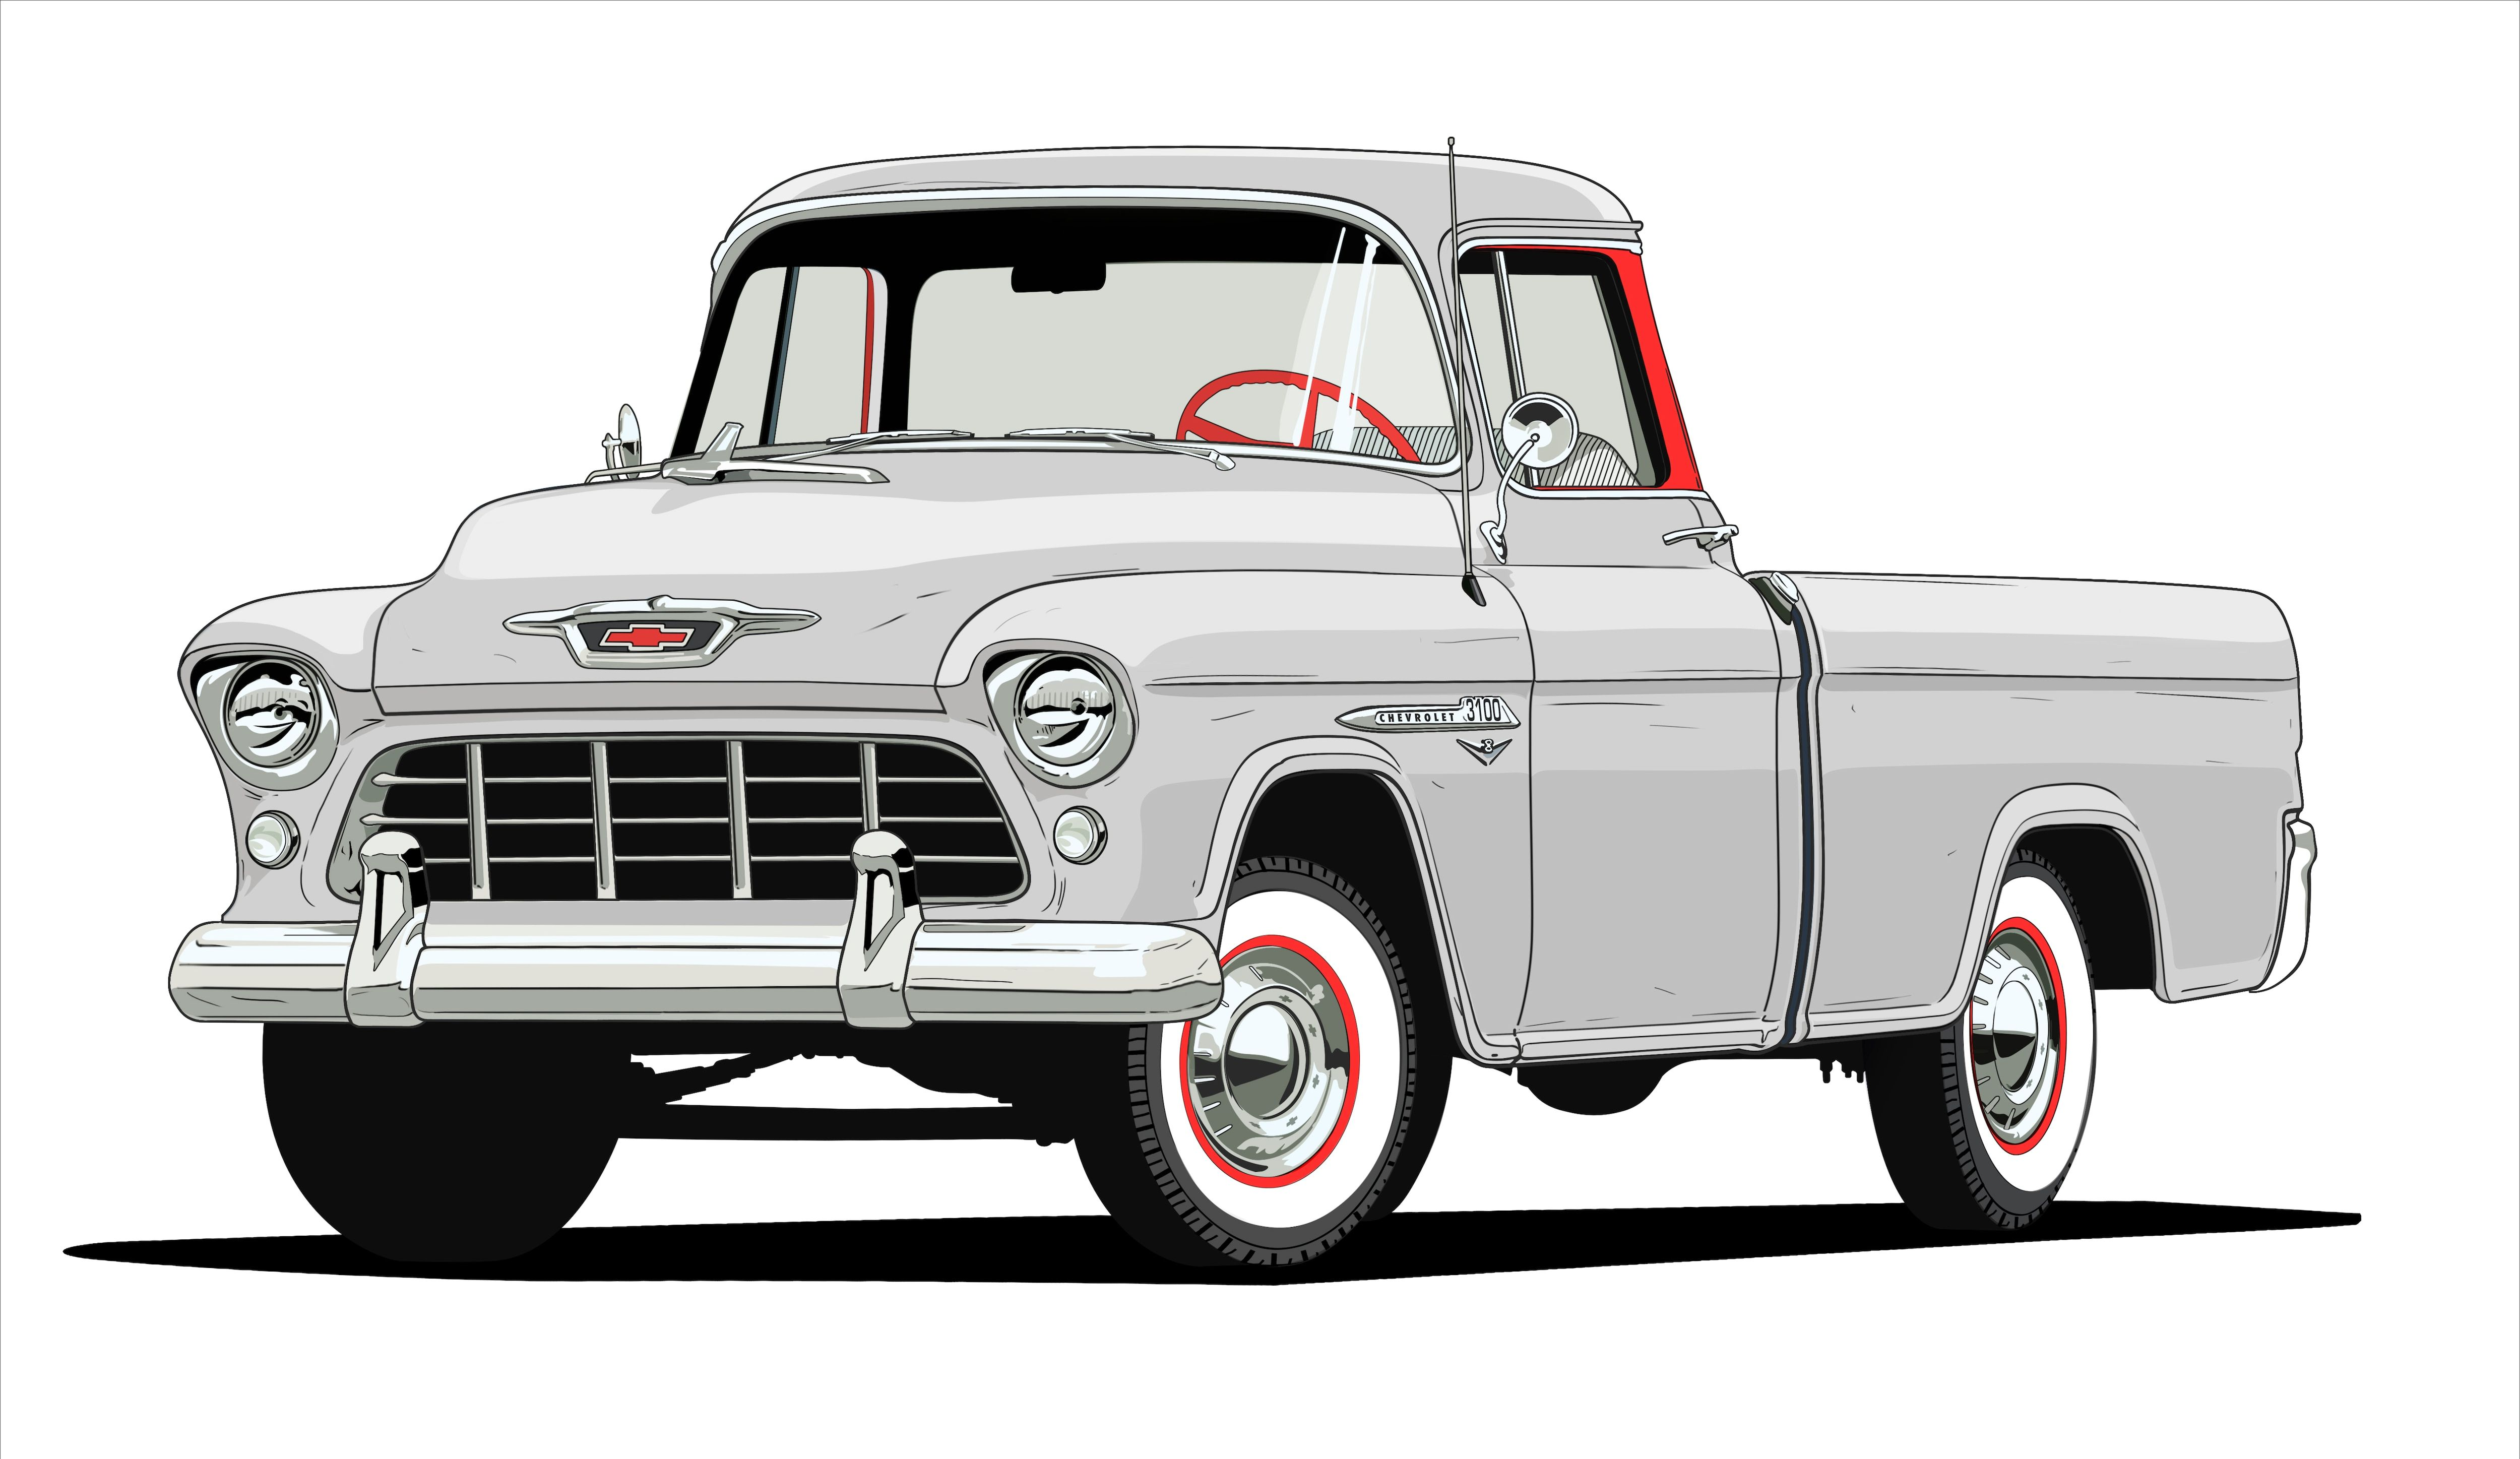 Task Force Era Chevy 3100 Pickup Truck Illustration Chevy Pickup Trucks Classic Chevy Trucks Chevy Trucks